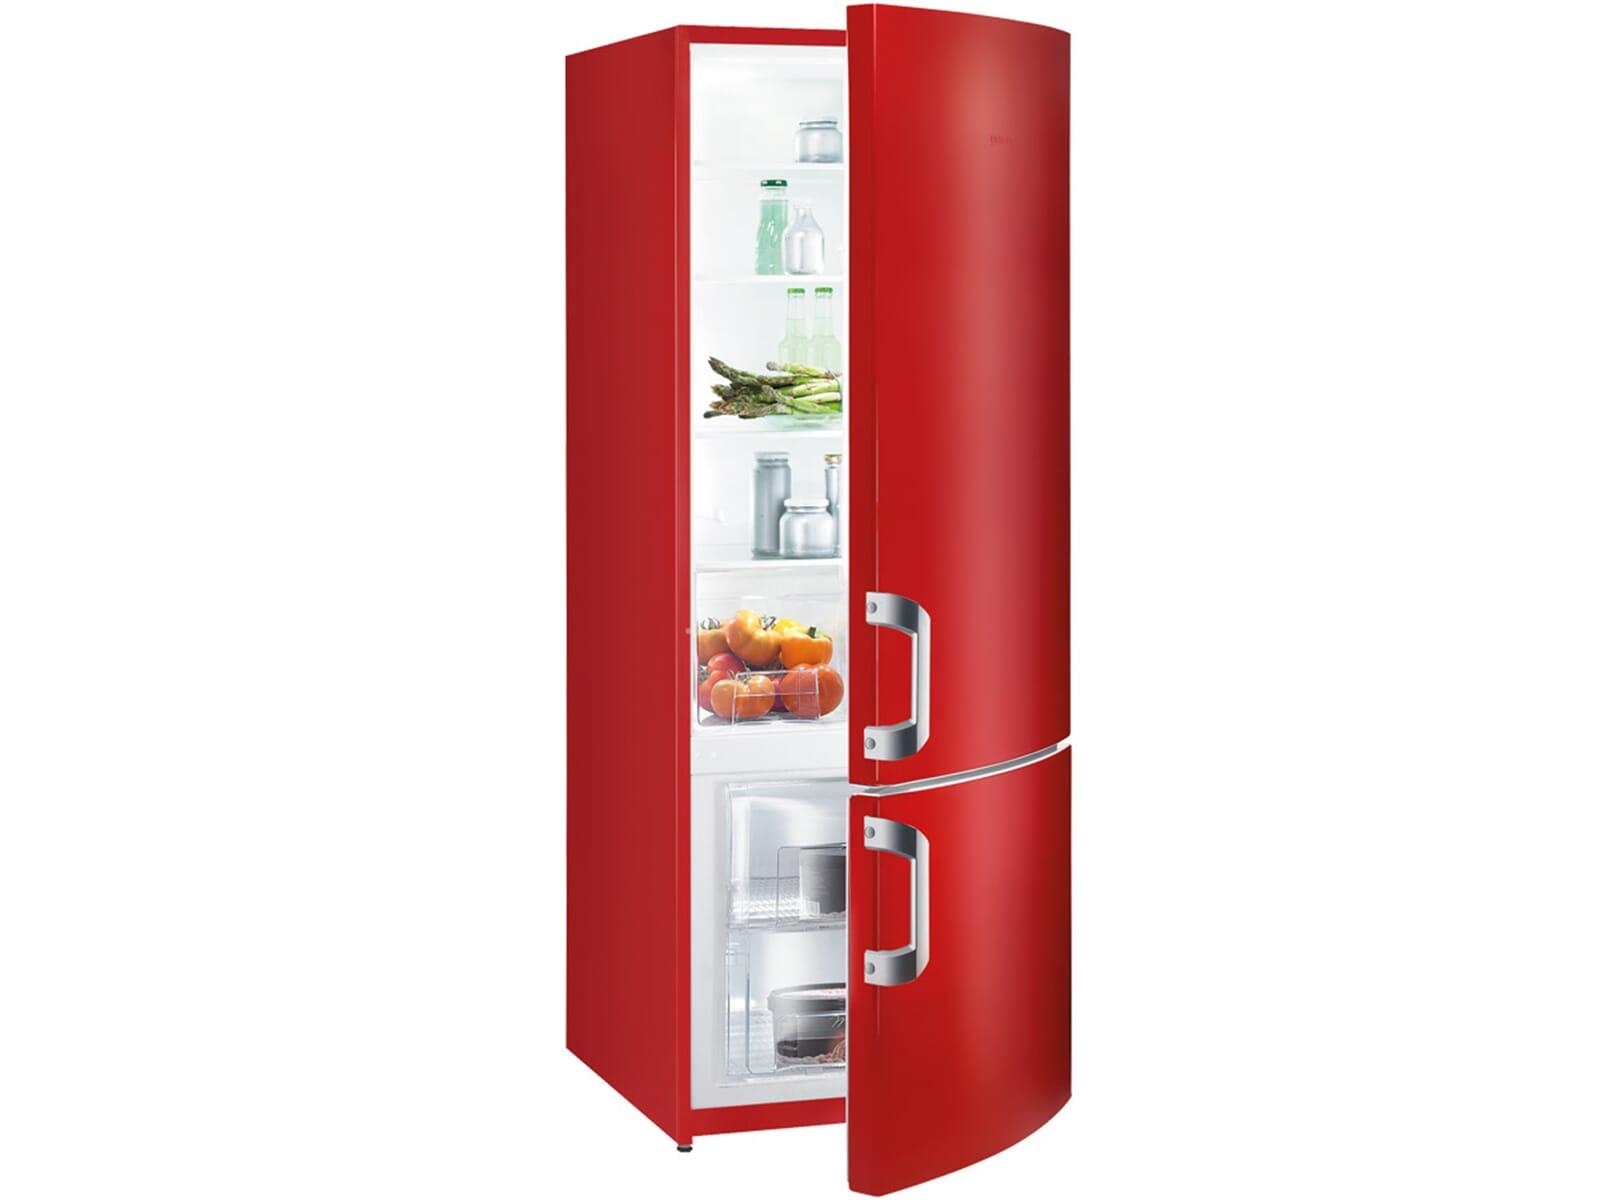 Gorenje Kühlschrank Creme : Gorenje kühlschrank gefrierkombination gorenje nrc 6192 tx